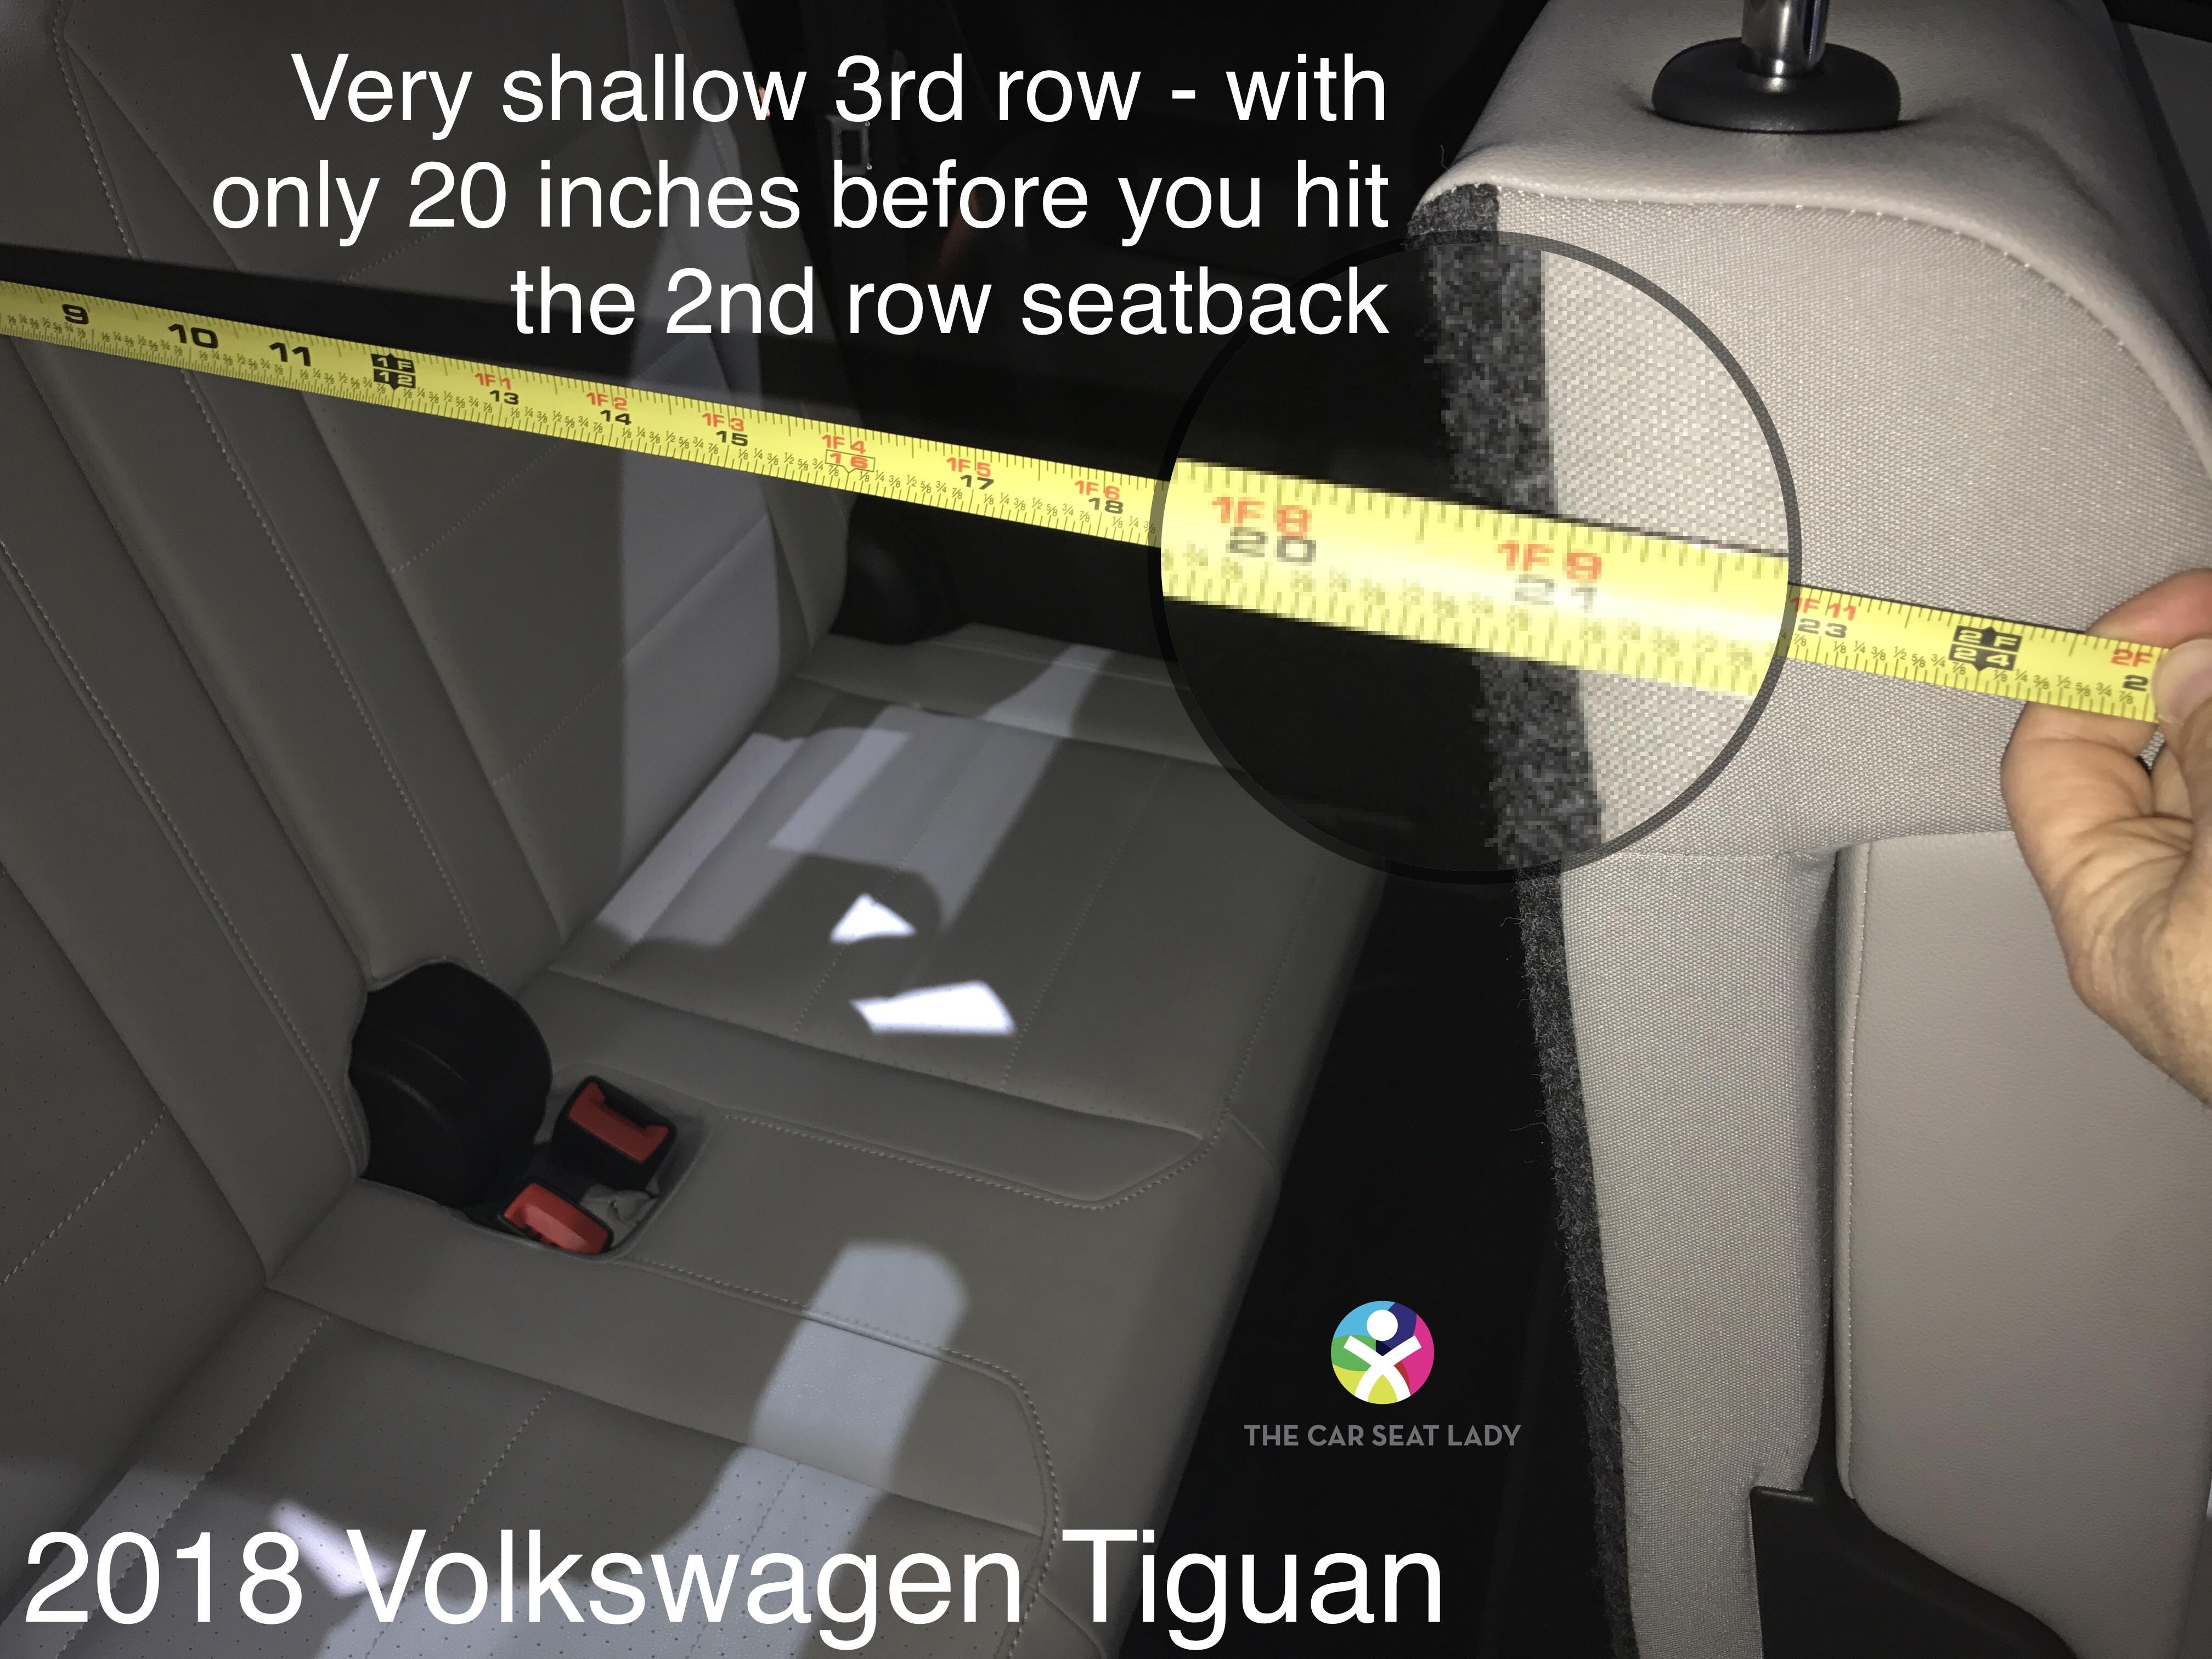 car seat lady volkswagen tiguan